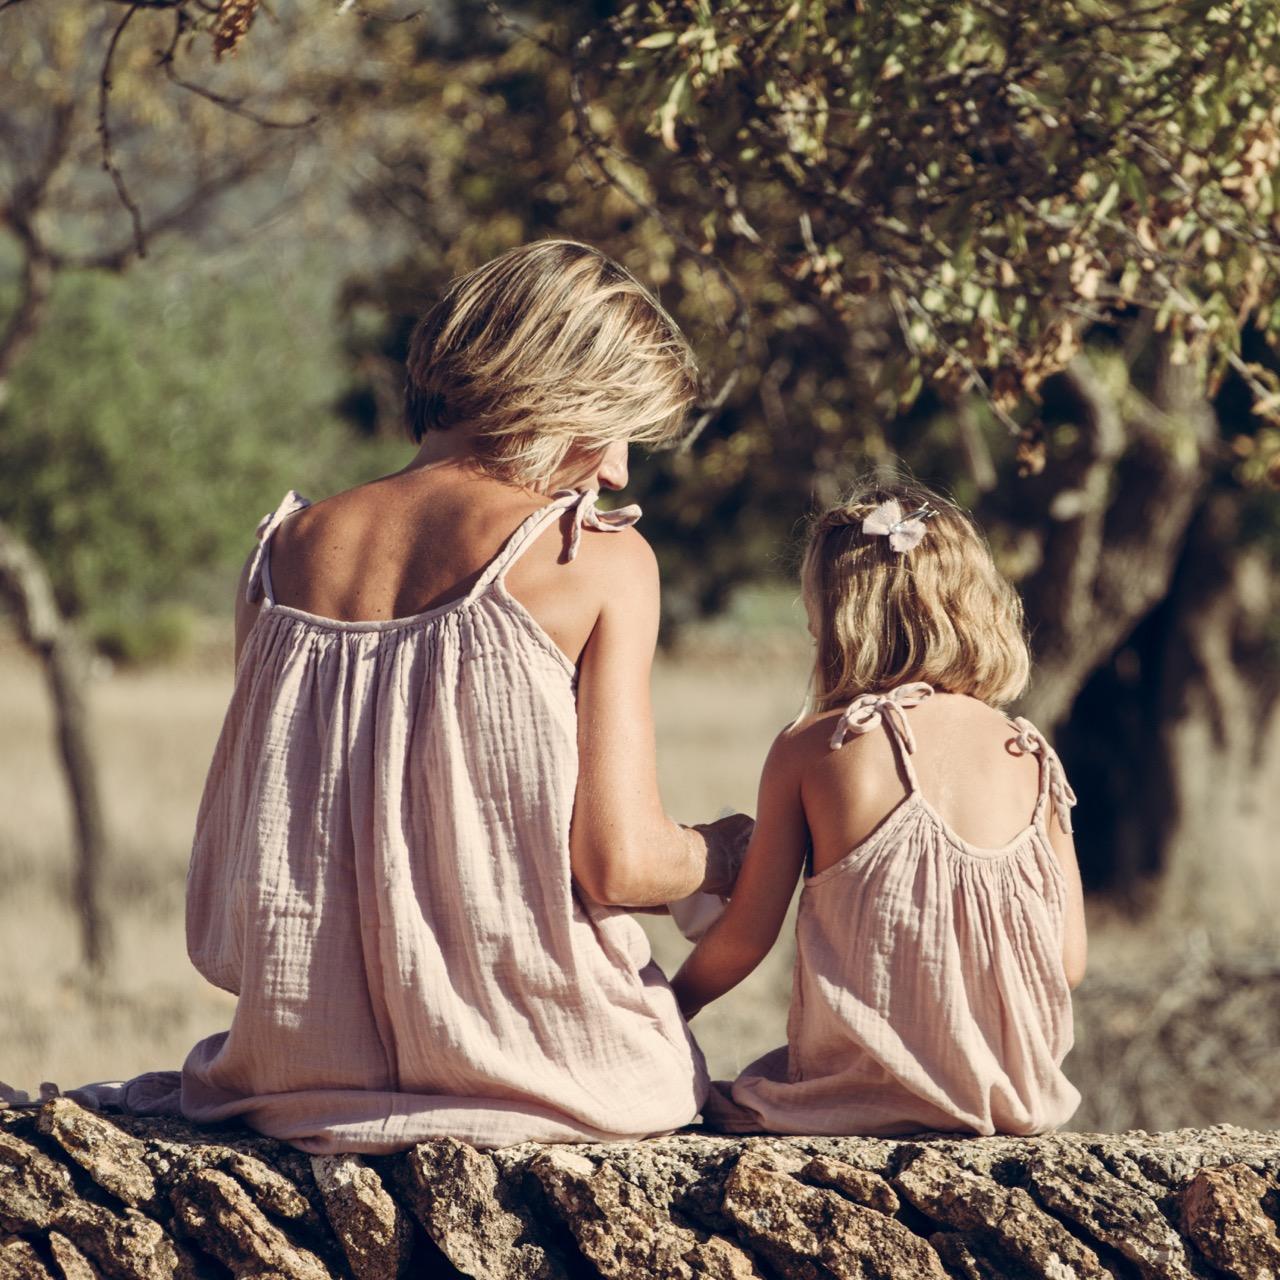 numero74-mum-kids-clothes-collection-20142015-5.jpg